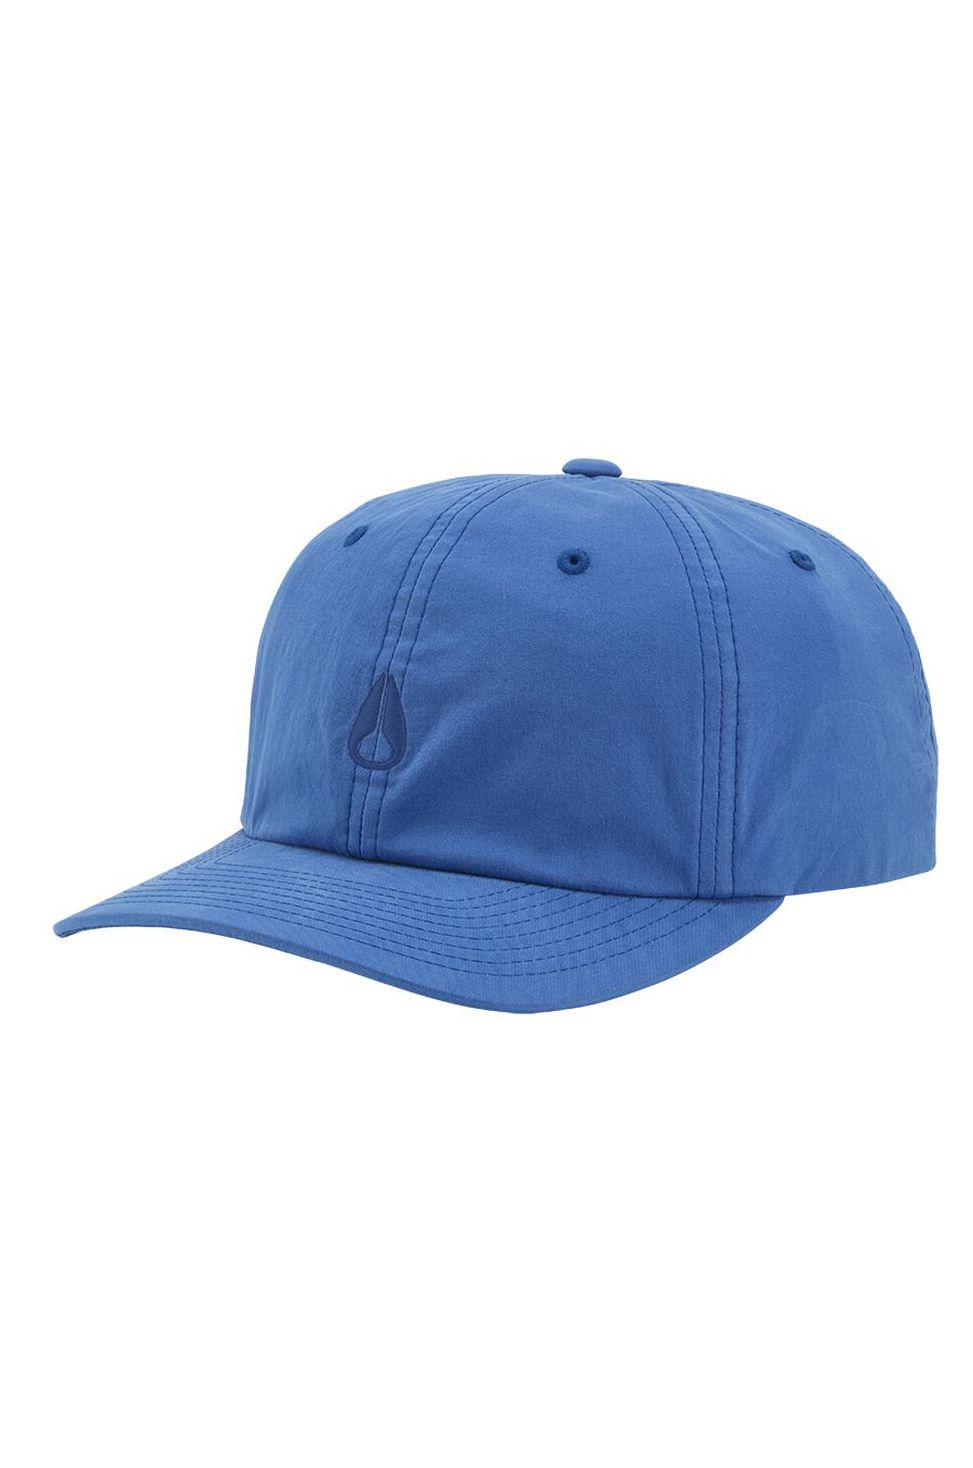 Nixon Cap   AGENT STRAPBACK HAT Horizon Blue